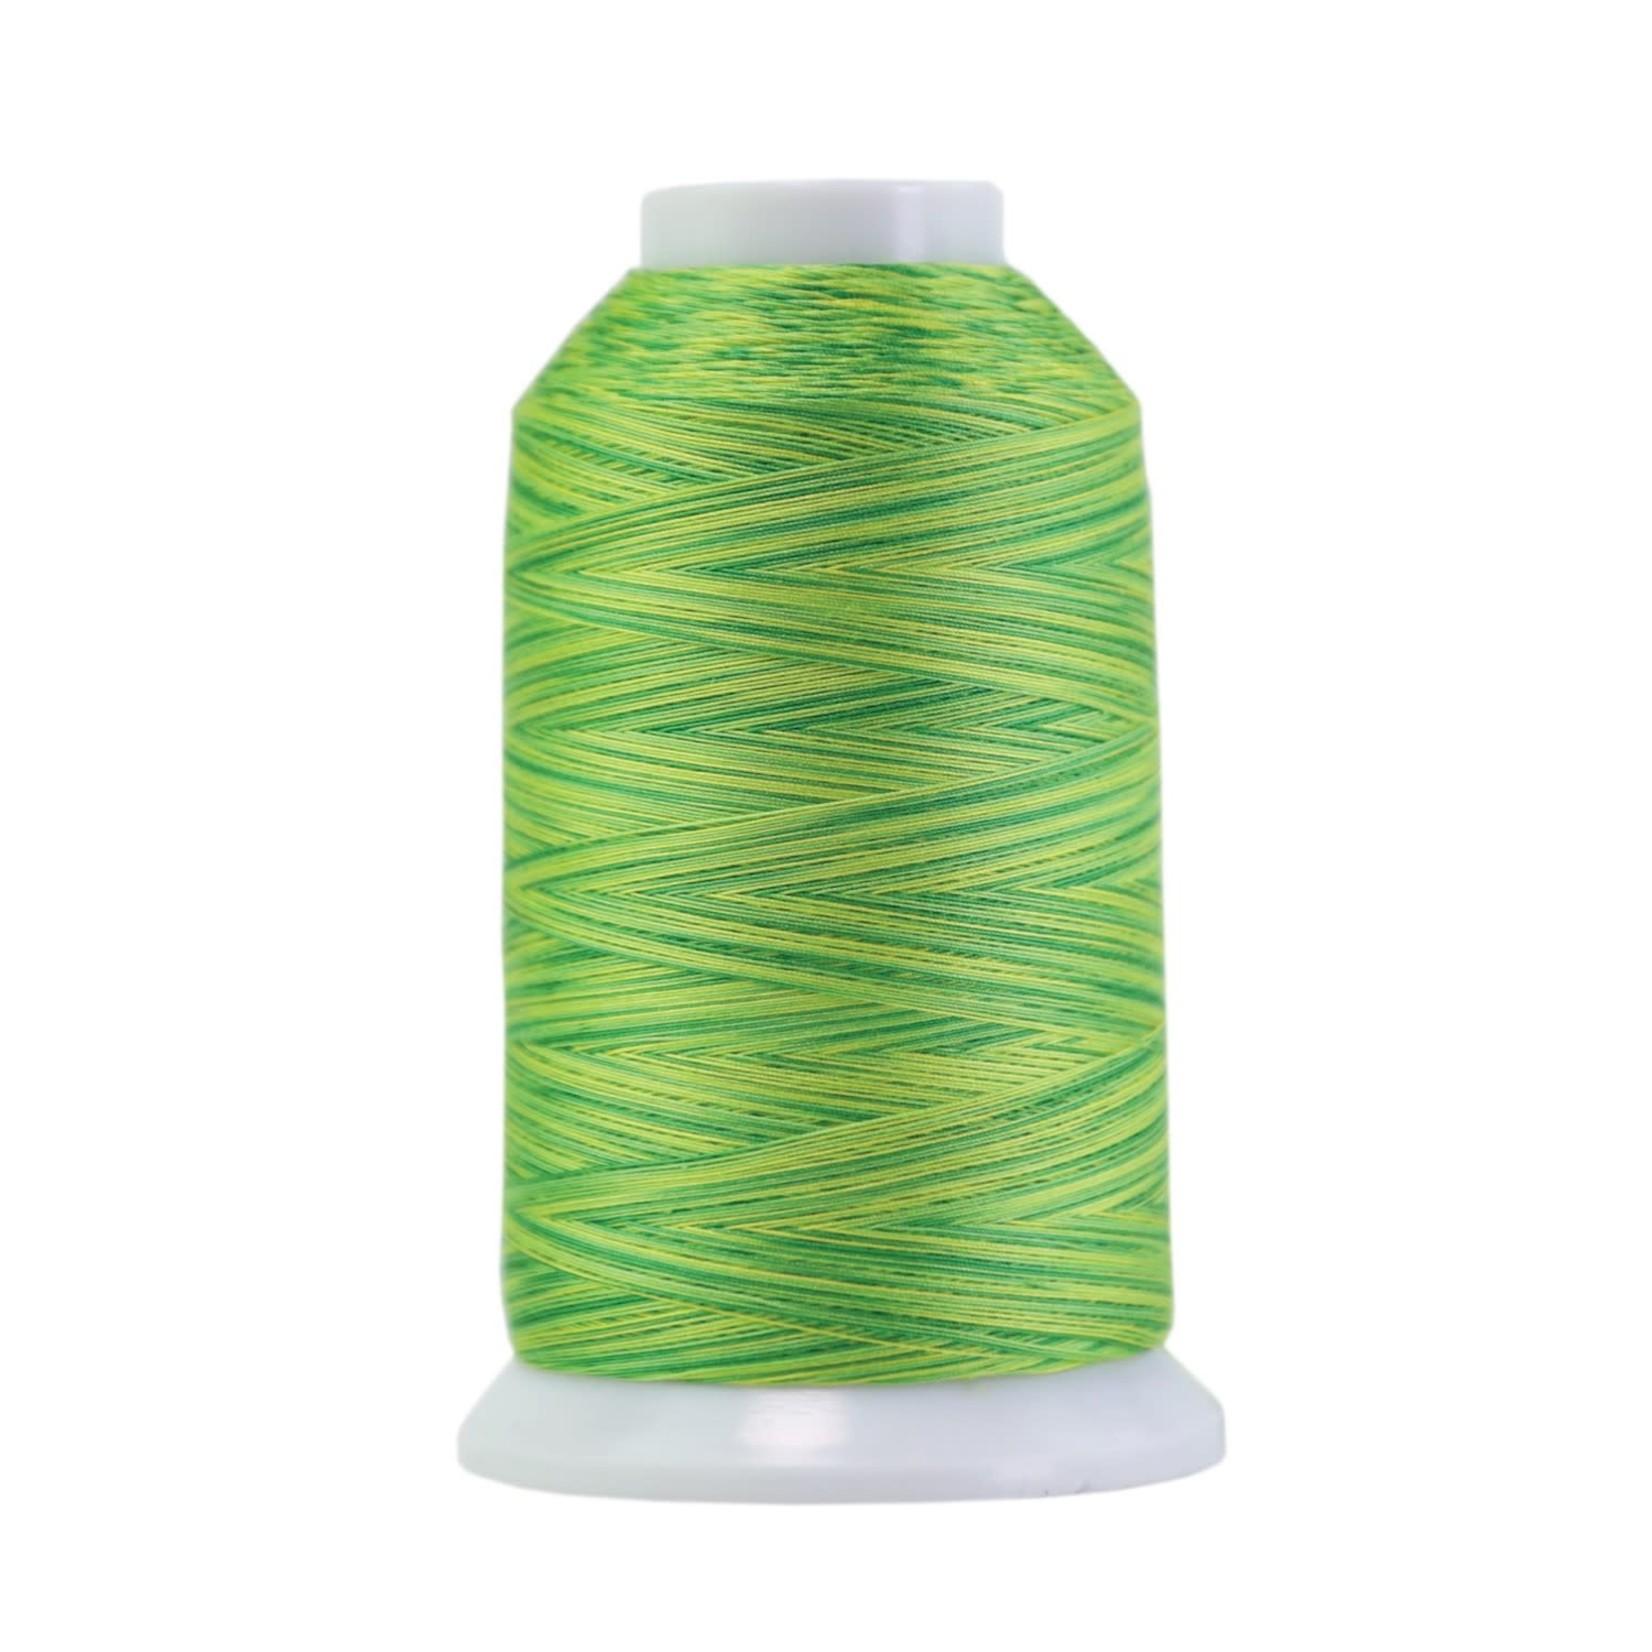 Superior Threads King Tut - #40 - 1828 m - 1040 Big Island